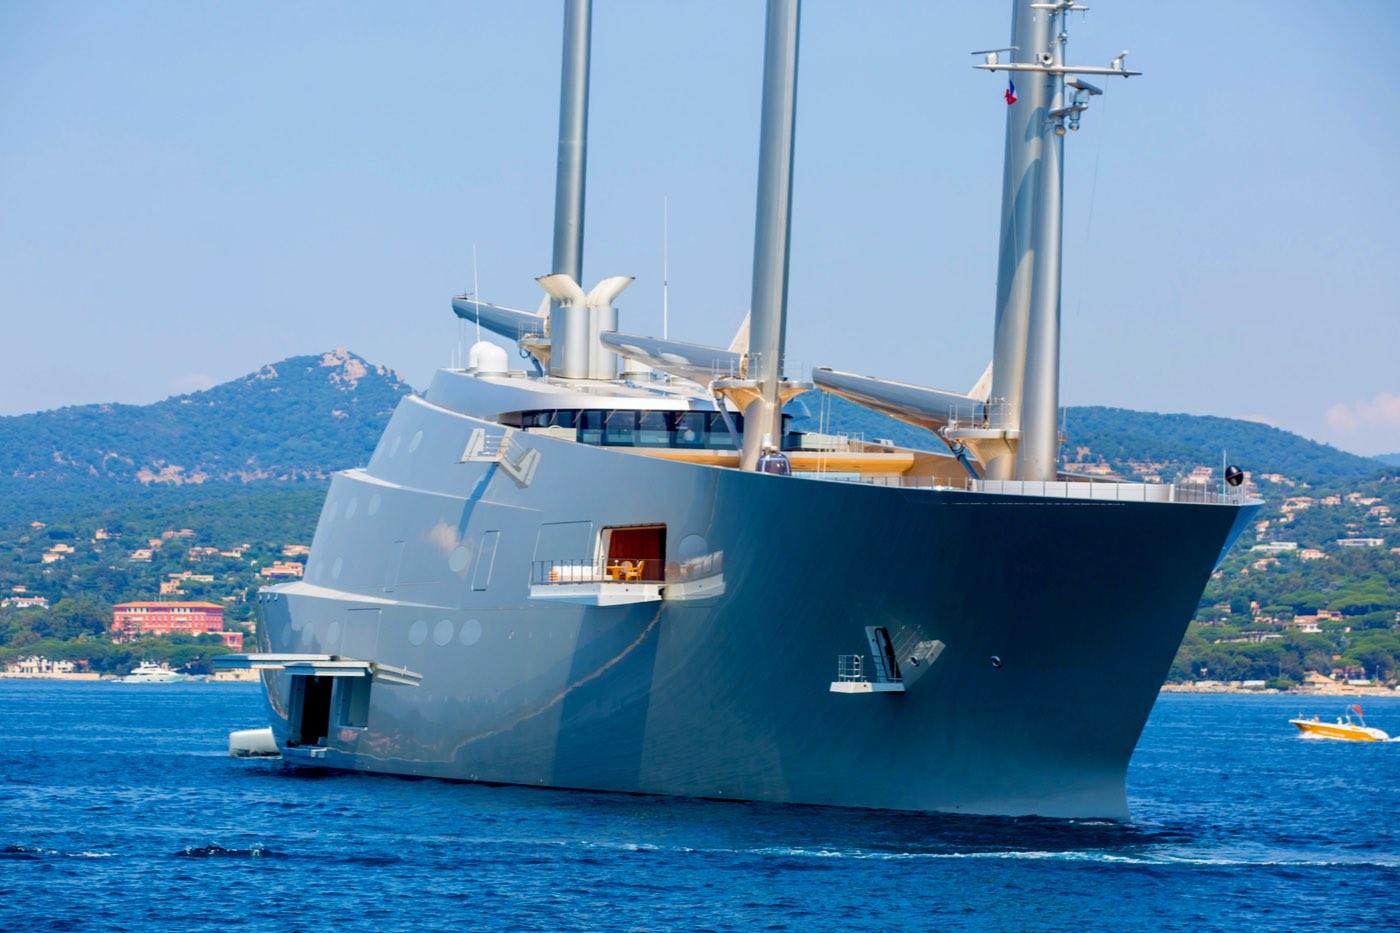 El colosal mega yate A o Sailing Yacht A